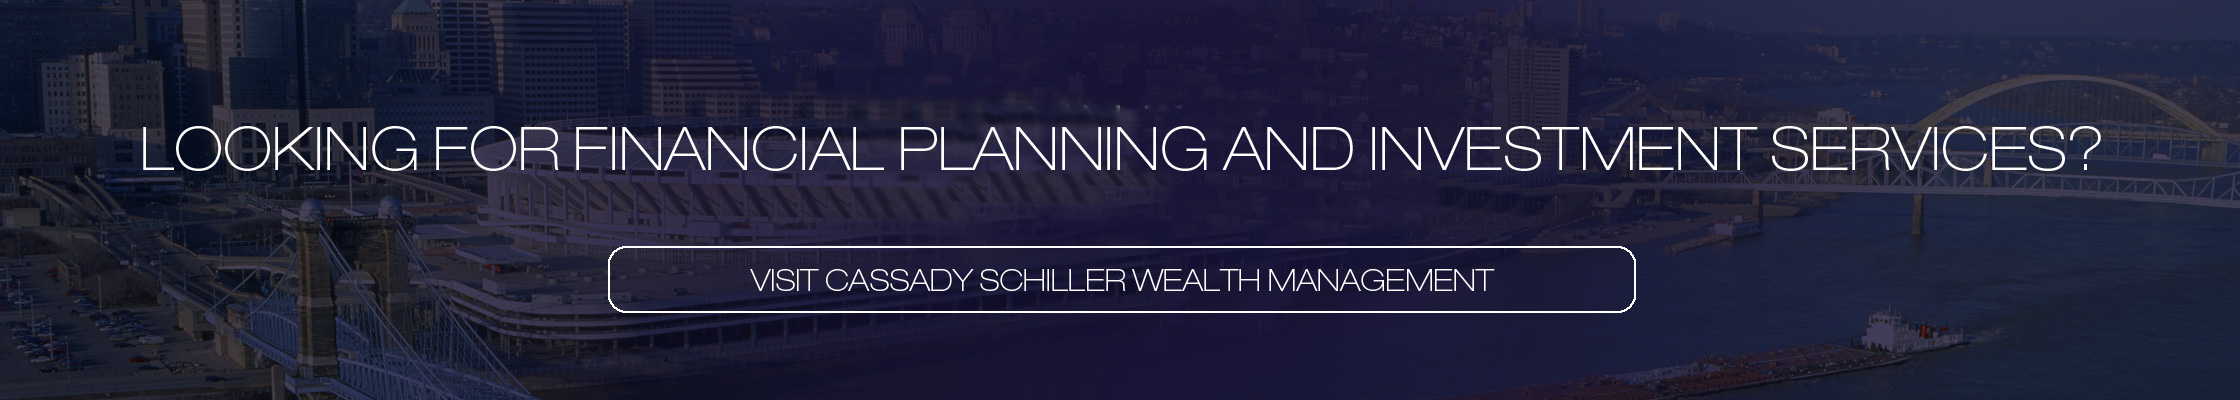 visit-cassady-schiller-wealth-management